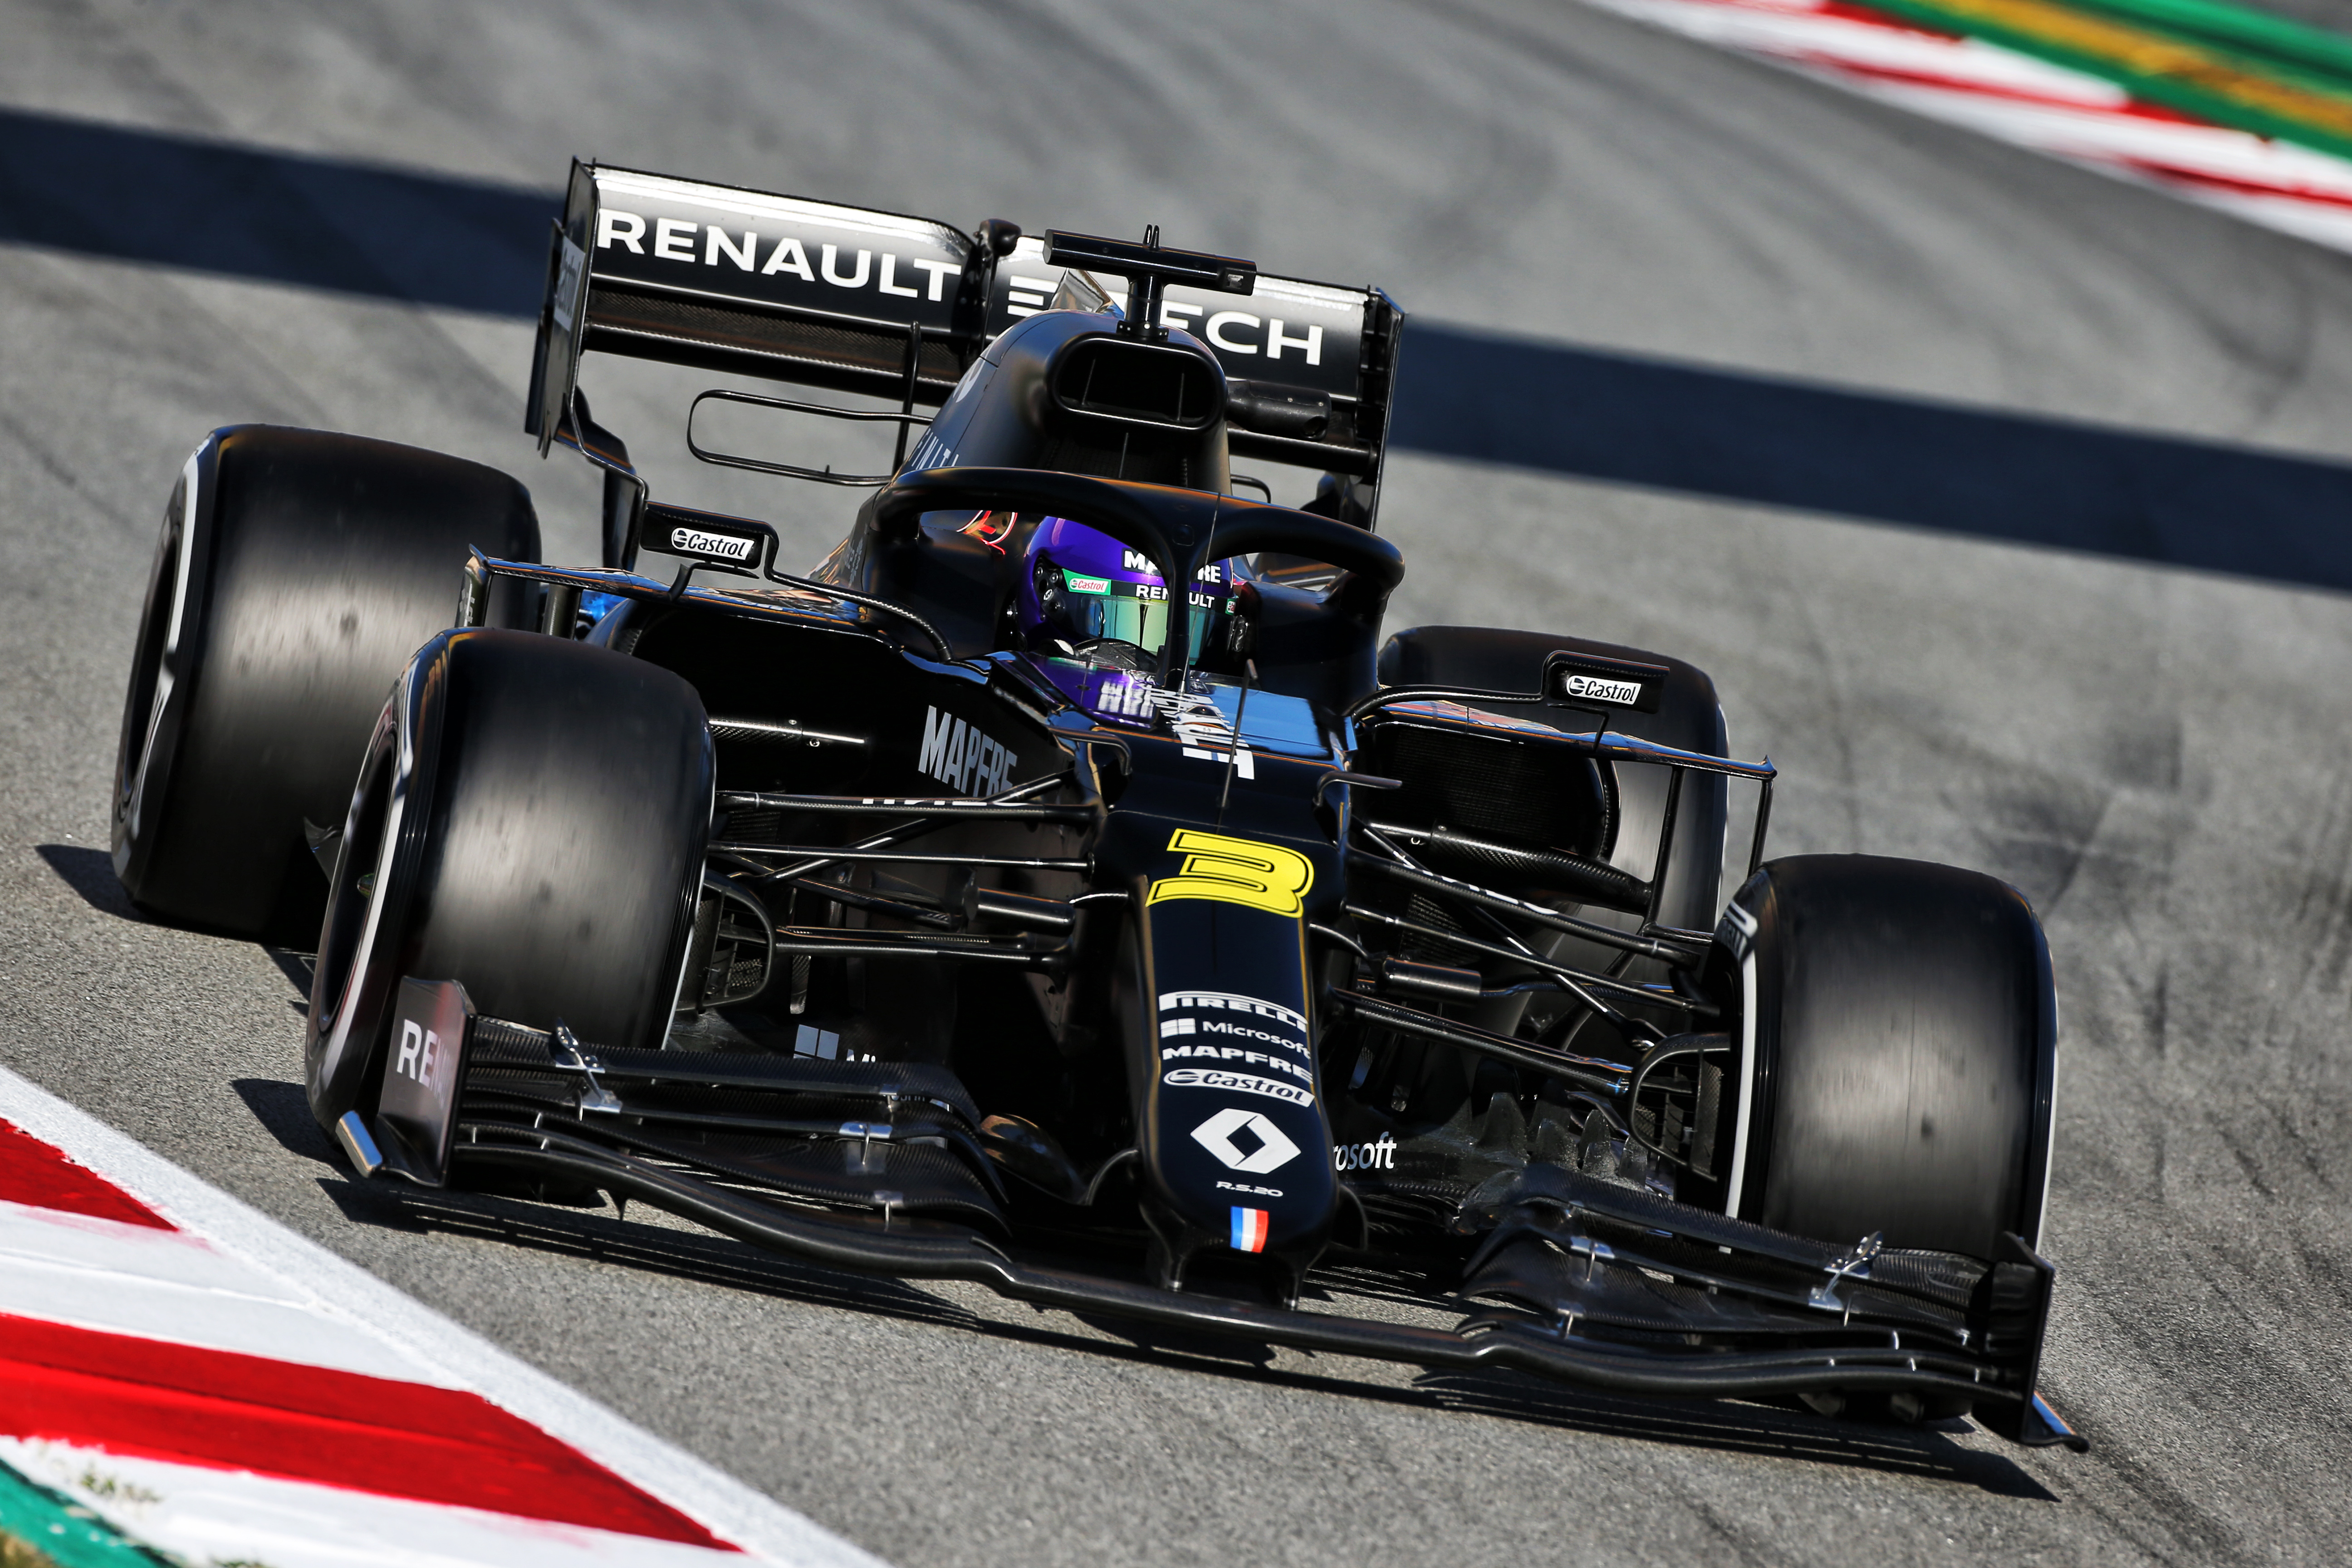 Daniel Ricciardo Renault Barcelona F1 testing 2020